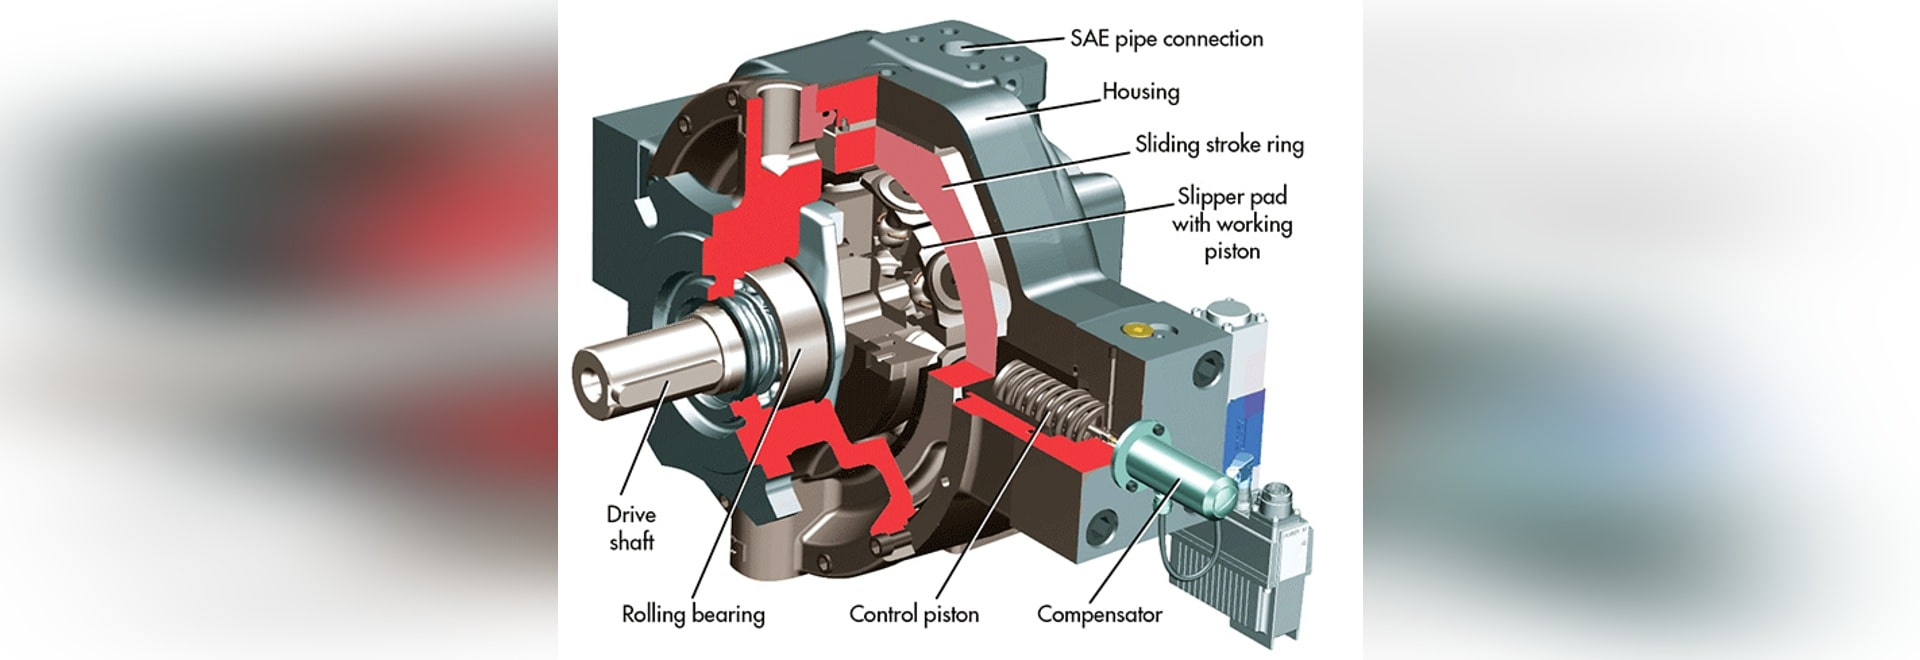 A Hydraulic Pump for High-Pressure Applications